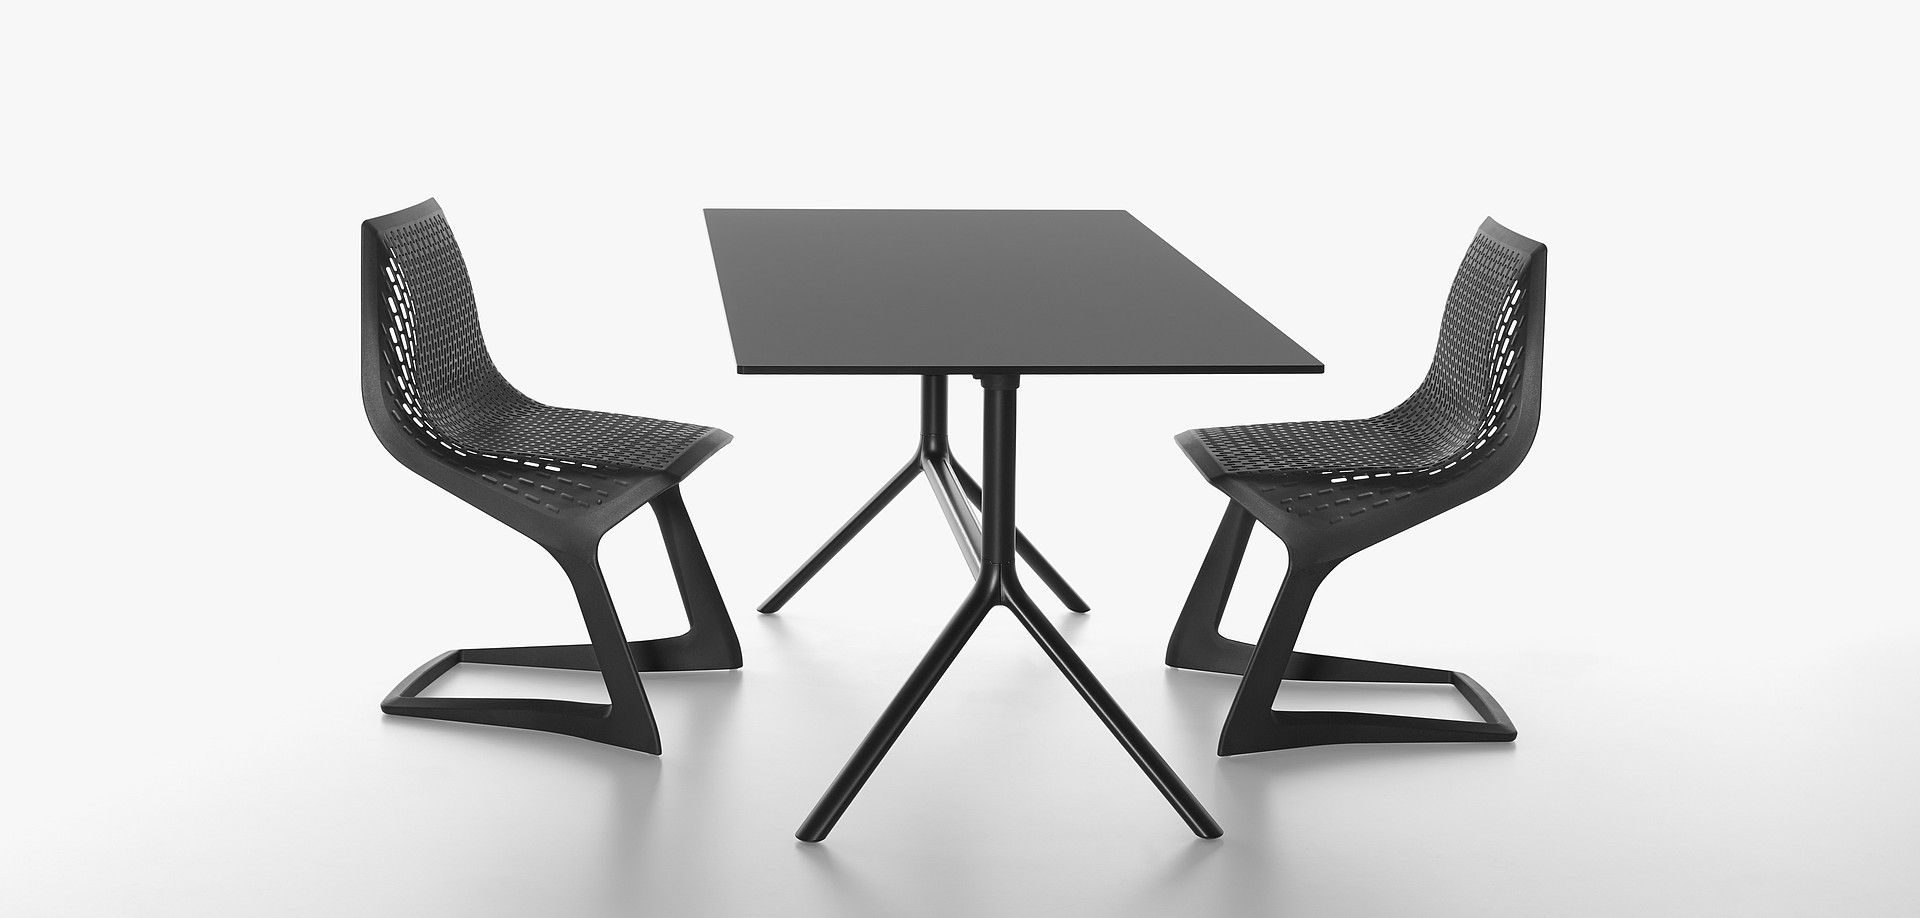 Plank Stuhl Myto Designermobel Von Raum Form Plank Stuhle